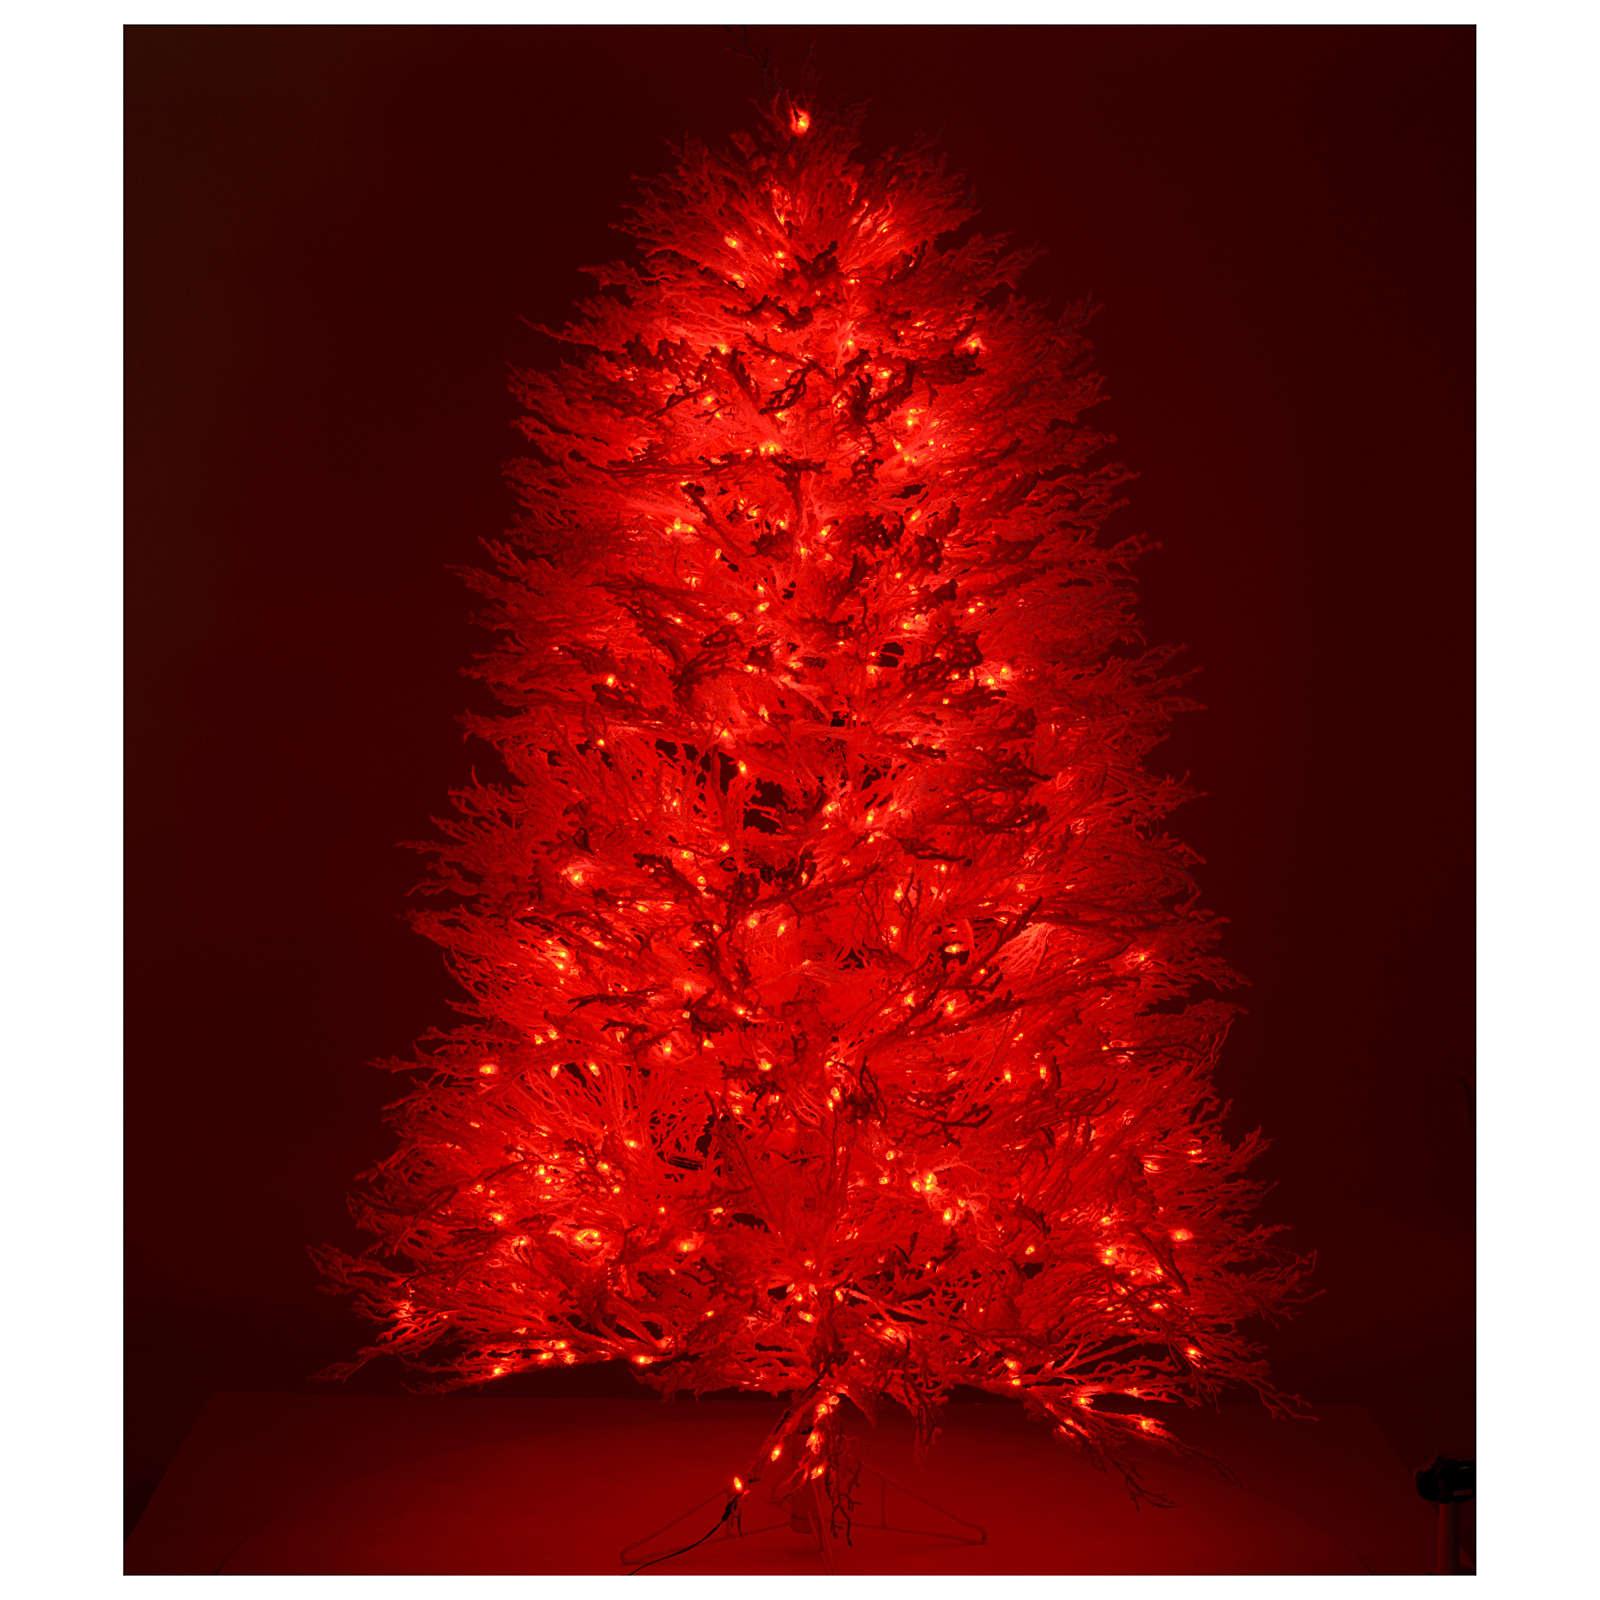 Rbol de navidad nevado blanco 210 cm 700 luces led rojas venta online en holyart - Luces led arbol navidad ...